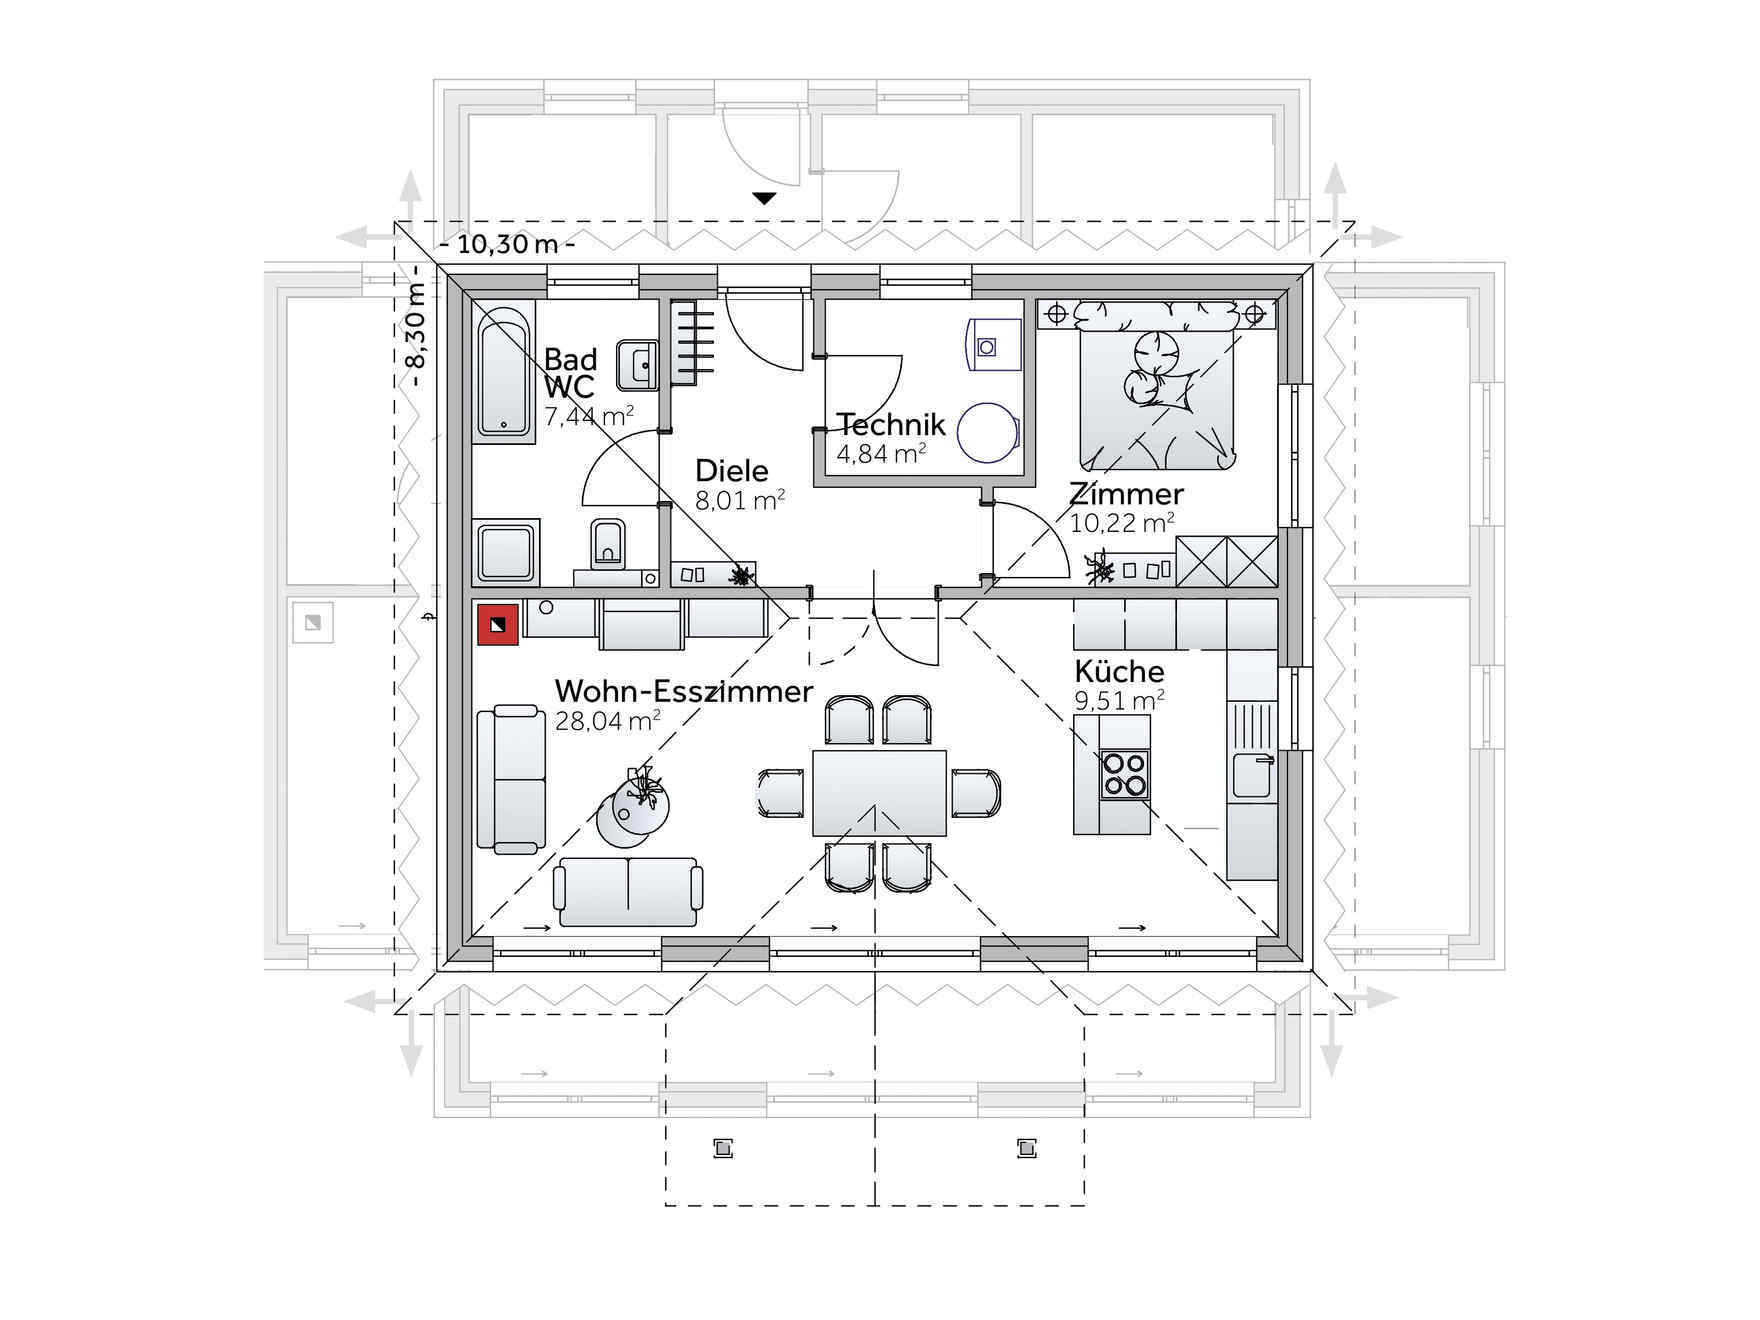 Bungalow Grundriss VARIO-HAUS New Design V Small